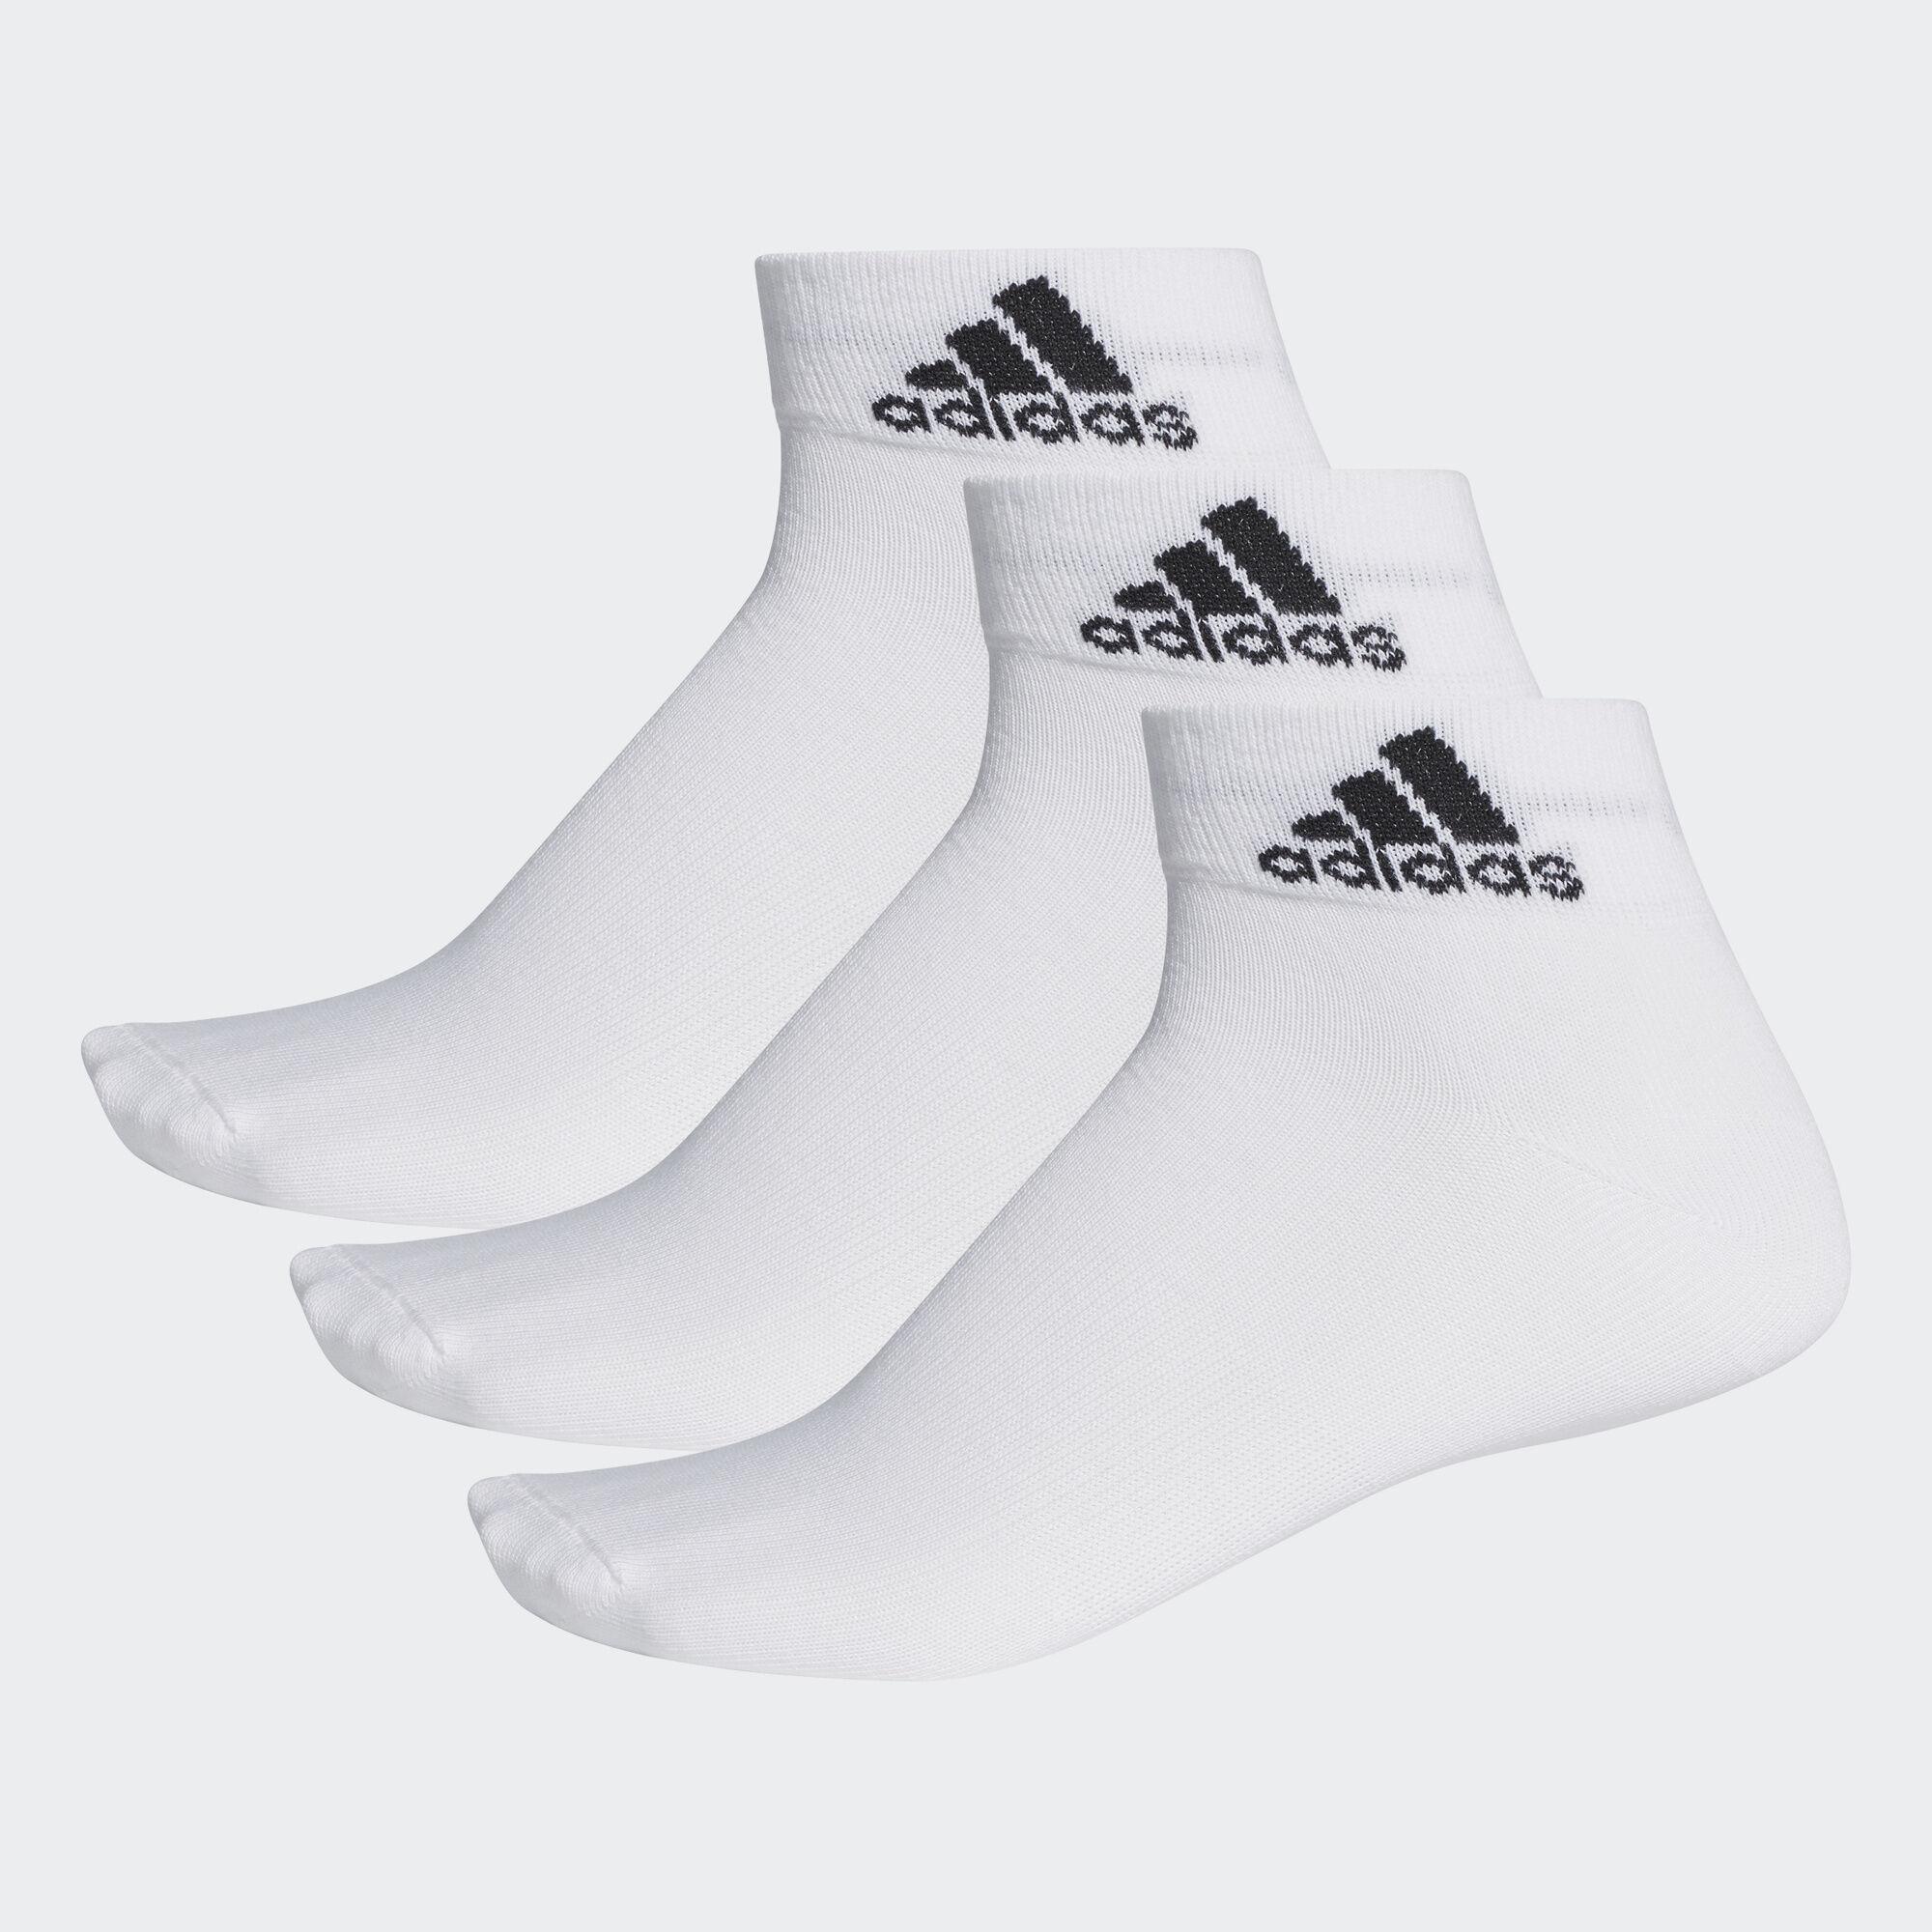 adidas - Performance Thin Ankle Socks 3 Pairs White AA2320. Training